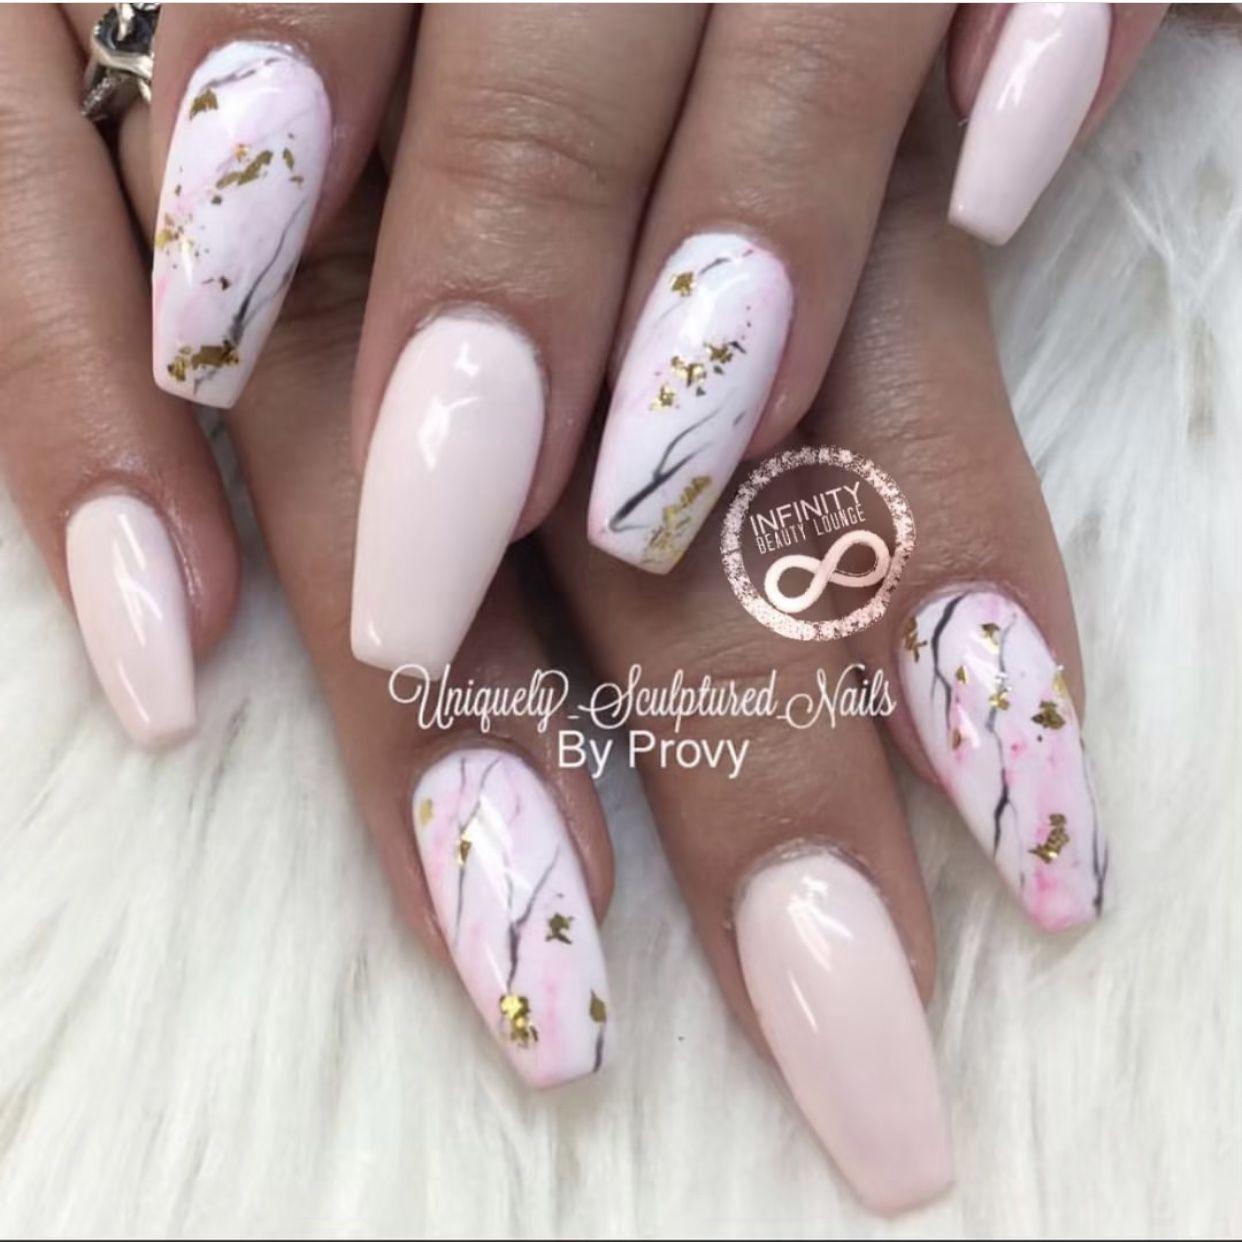 Infinity Beauty Lounge Jax Ph 904 274 9333 Located At 3864 San Jose Park Blvd Jax Fl 32217 Full Nail Hair New French Manicure Glitter French Manicure Nails